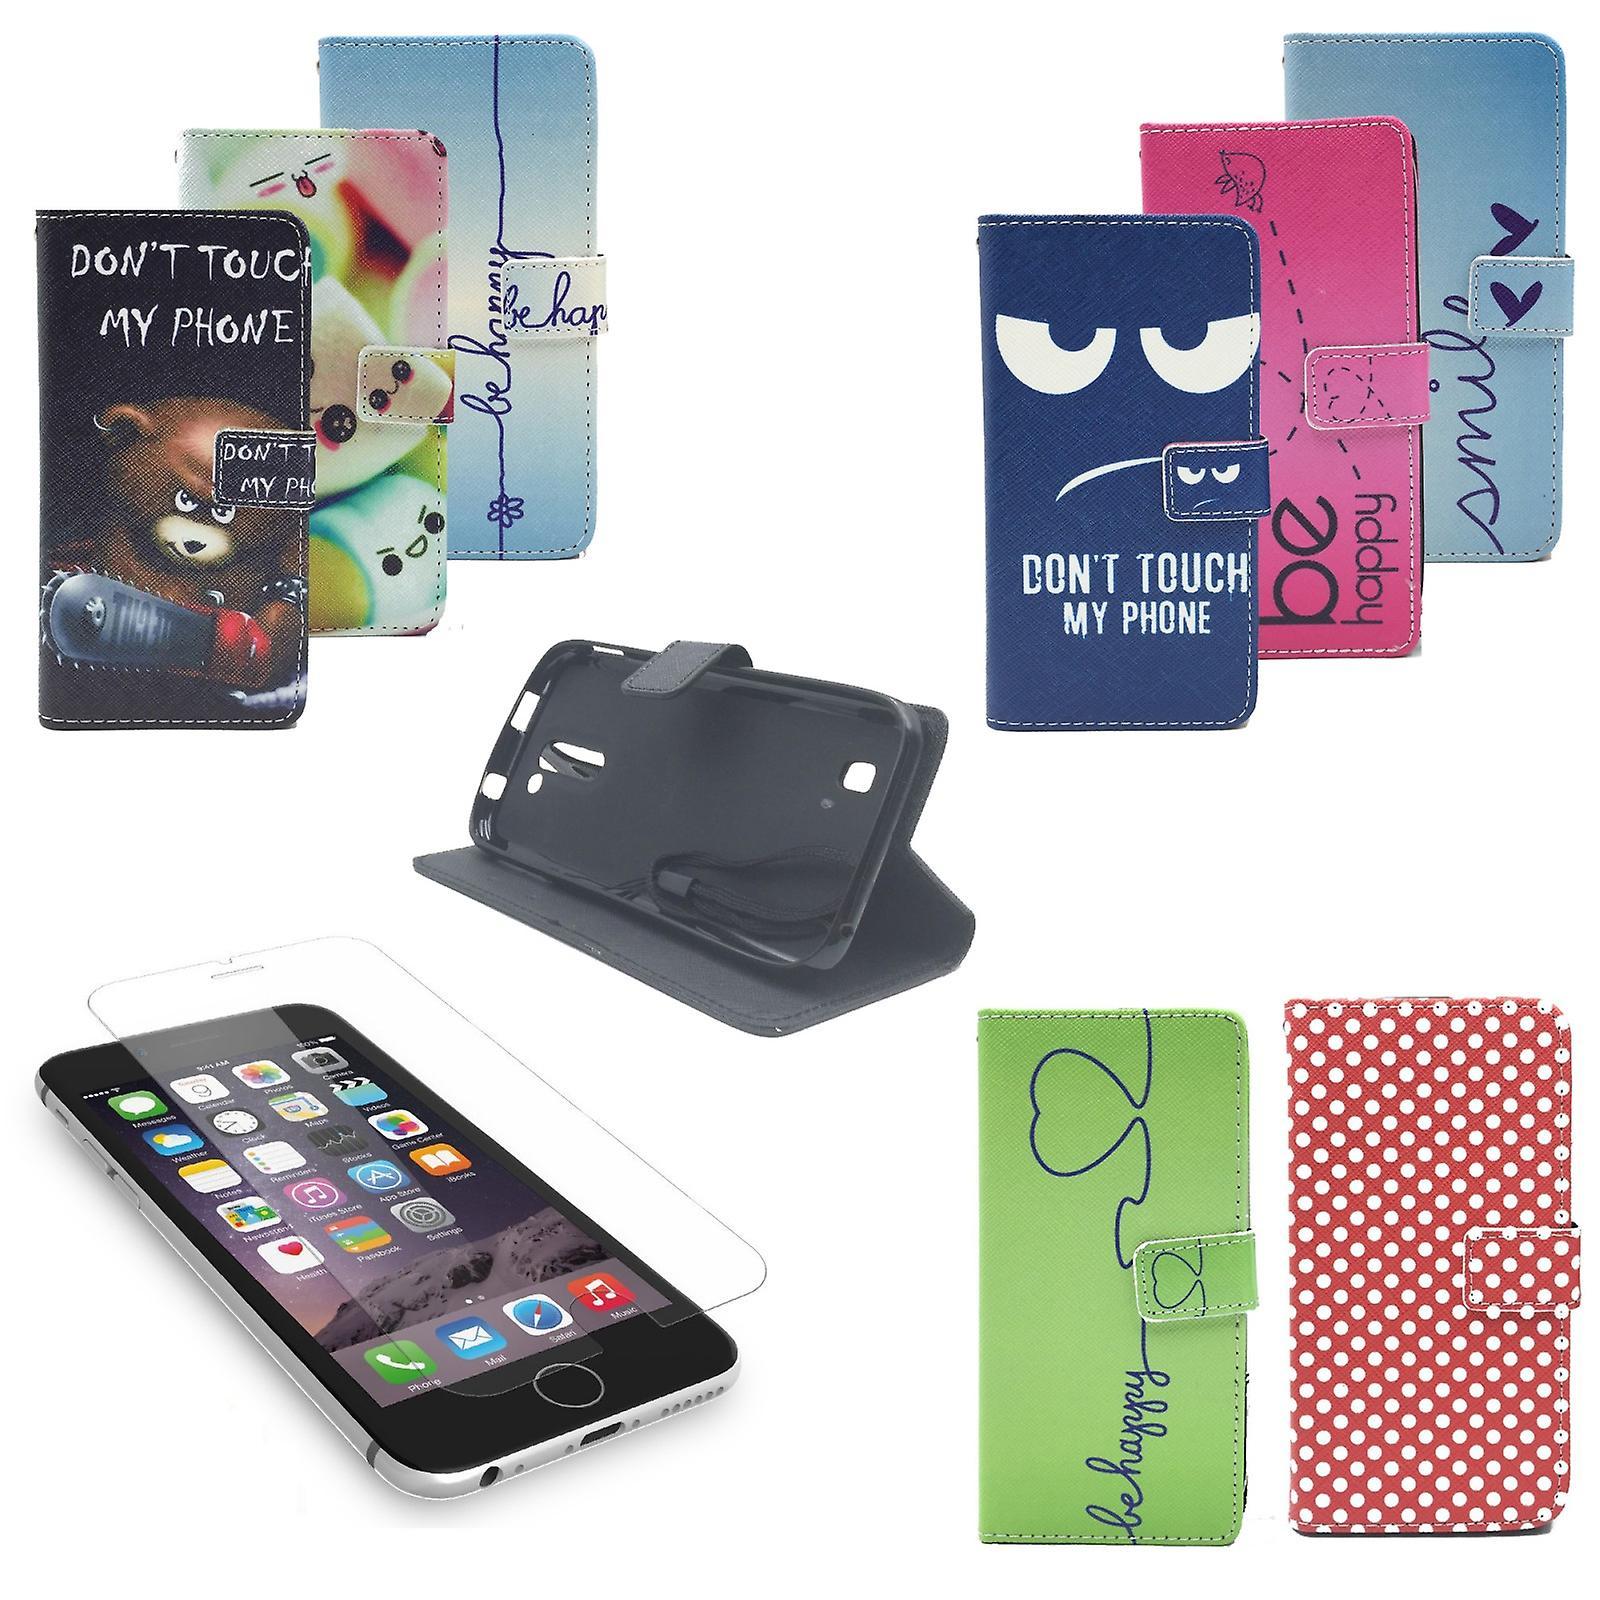 e3c7bea8d9e56 Handy Tasche für Apple Flip Cover Case Schutz Hülle Etui Schale Wallet  Bumper